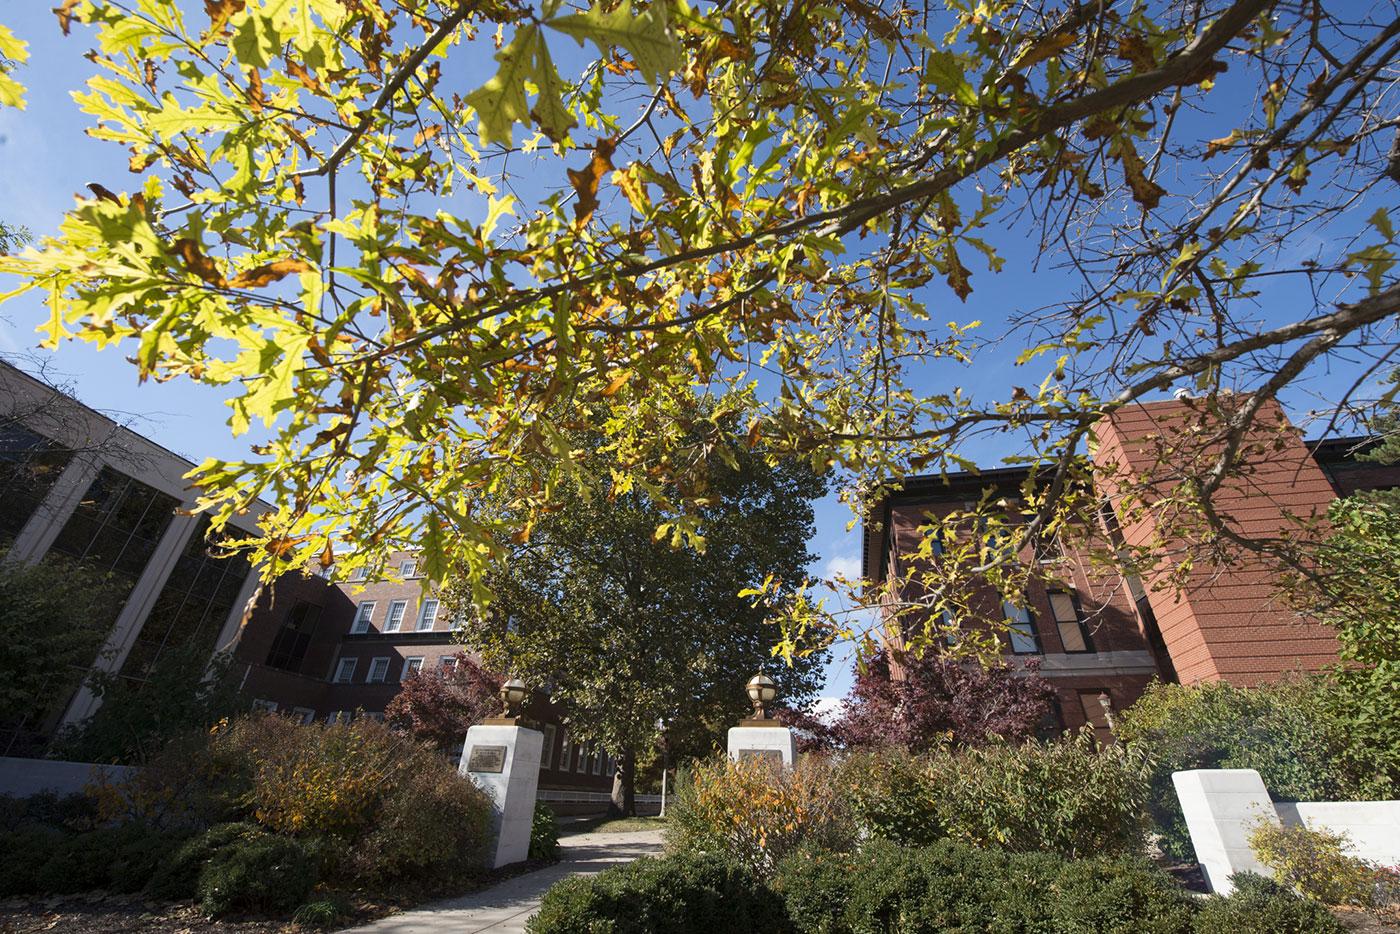 Campus trees at Illinois State University